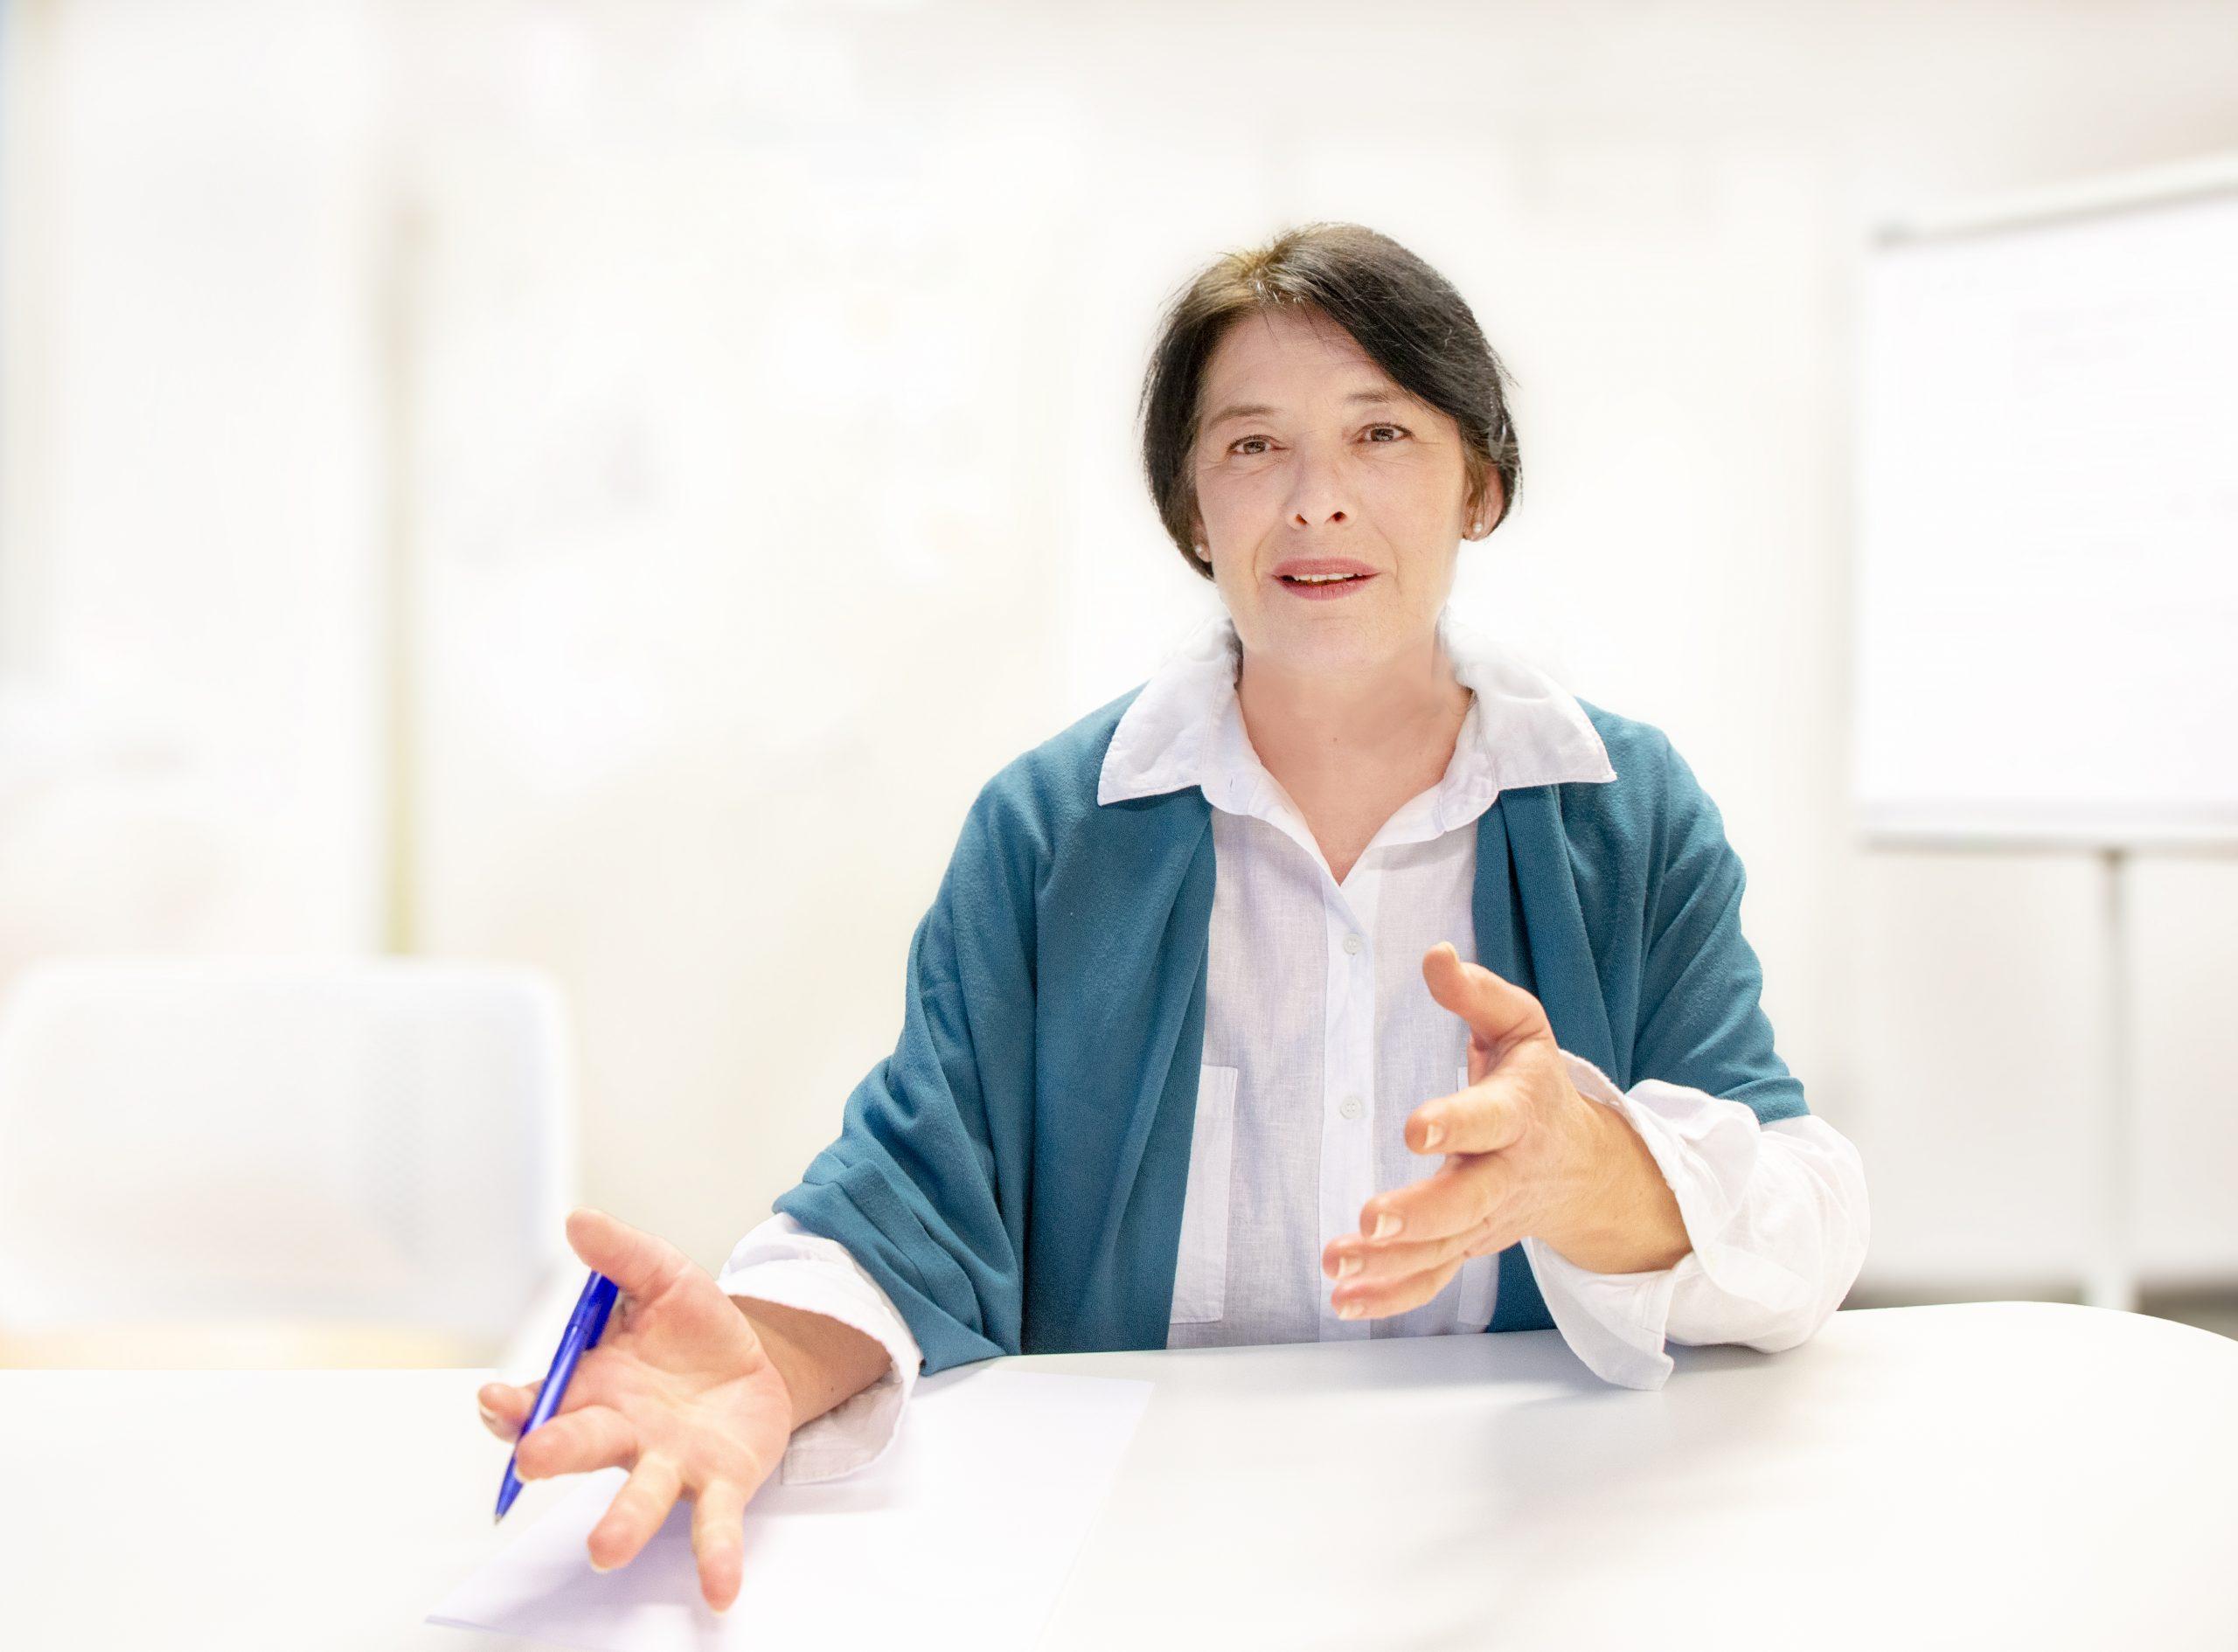 Betriebliche Gesundheitsberatung, Coaching